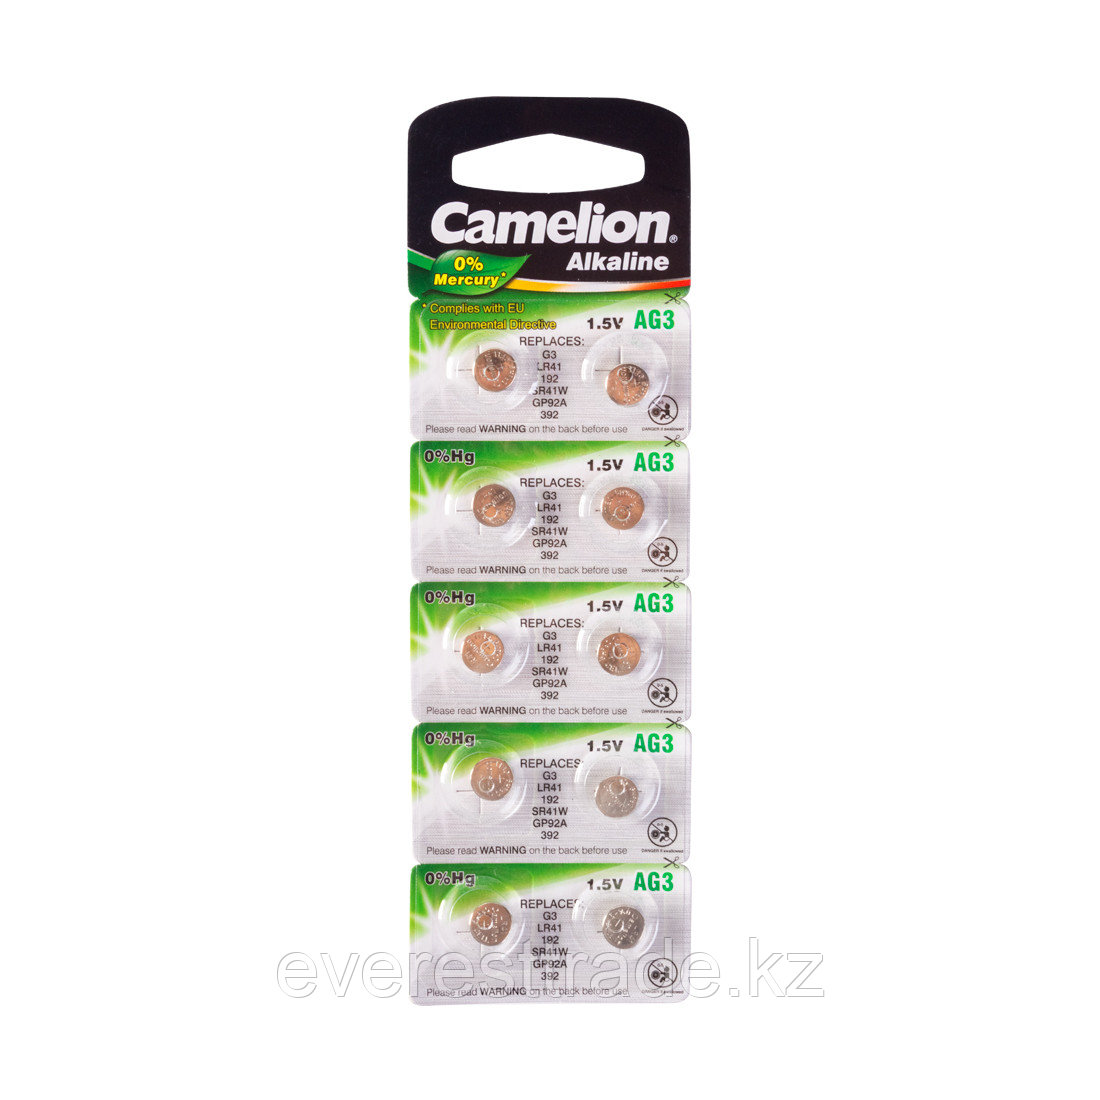 Camelion Батарейки, CAMELION, AG3-BP10, Alkaline, AG3, 1.5V, 0% Ртути, 10 шт. в блистере